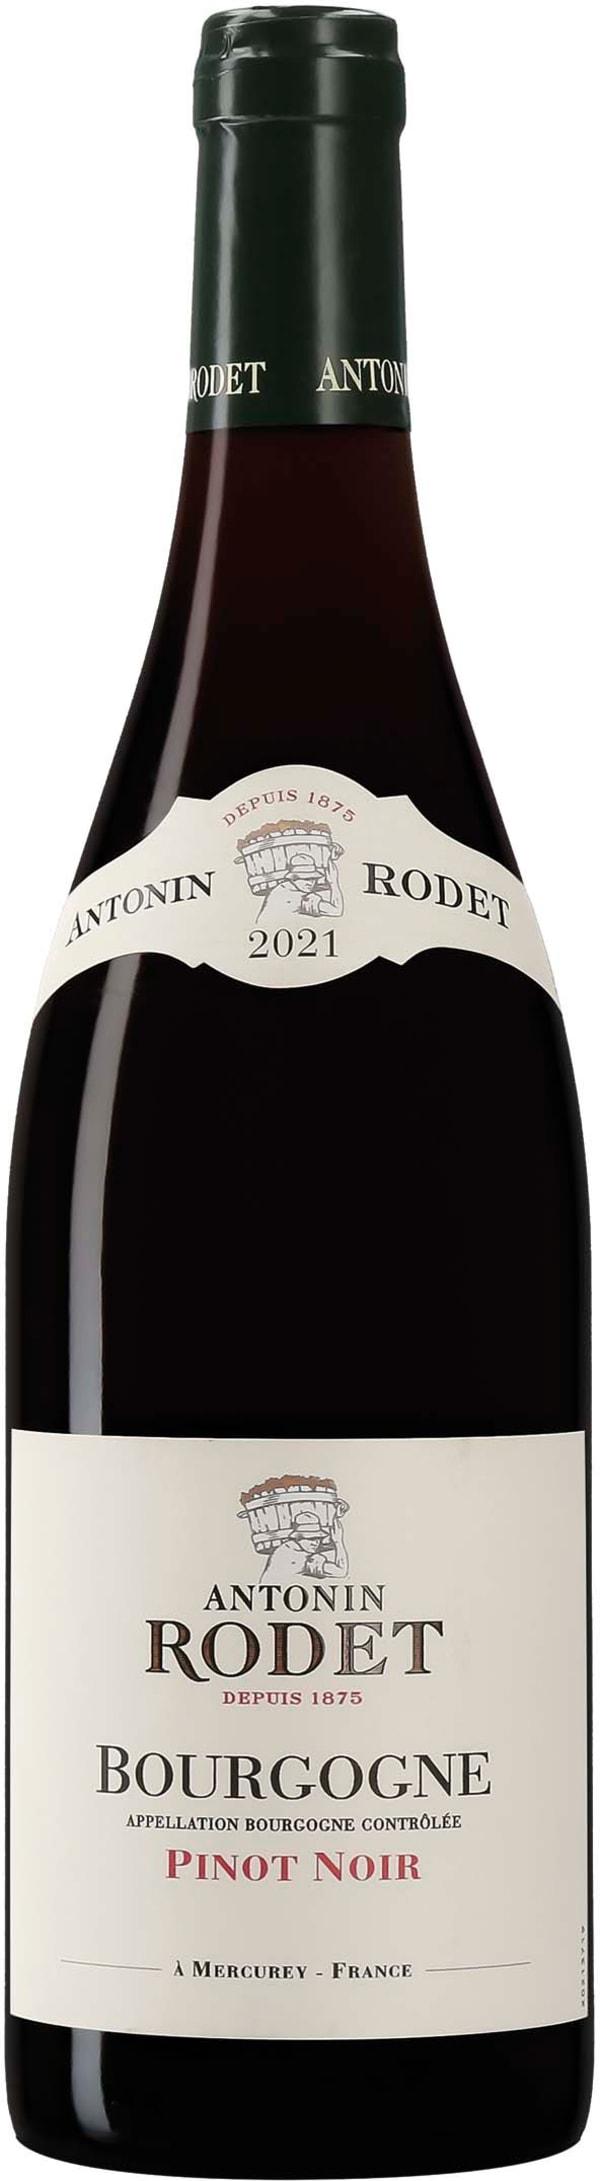 Antonin Rodet Pinot Noir 2017